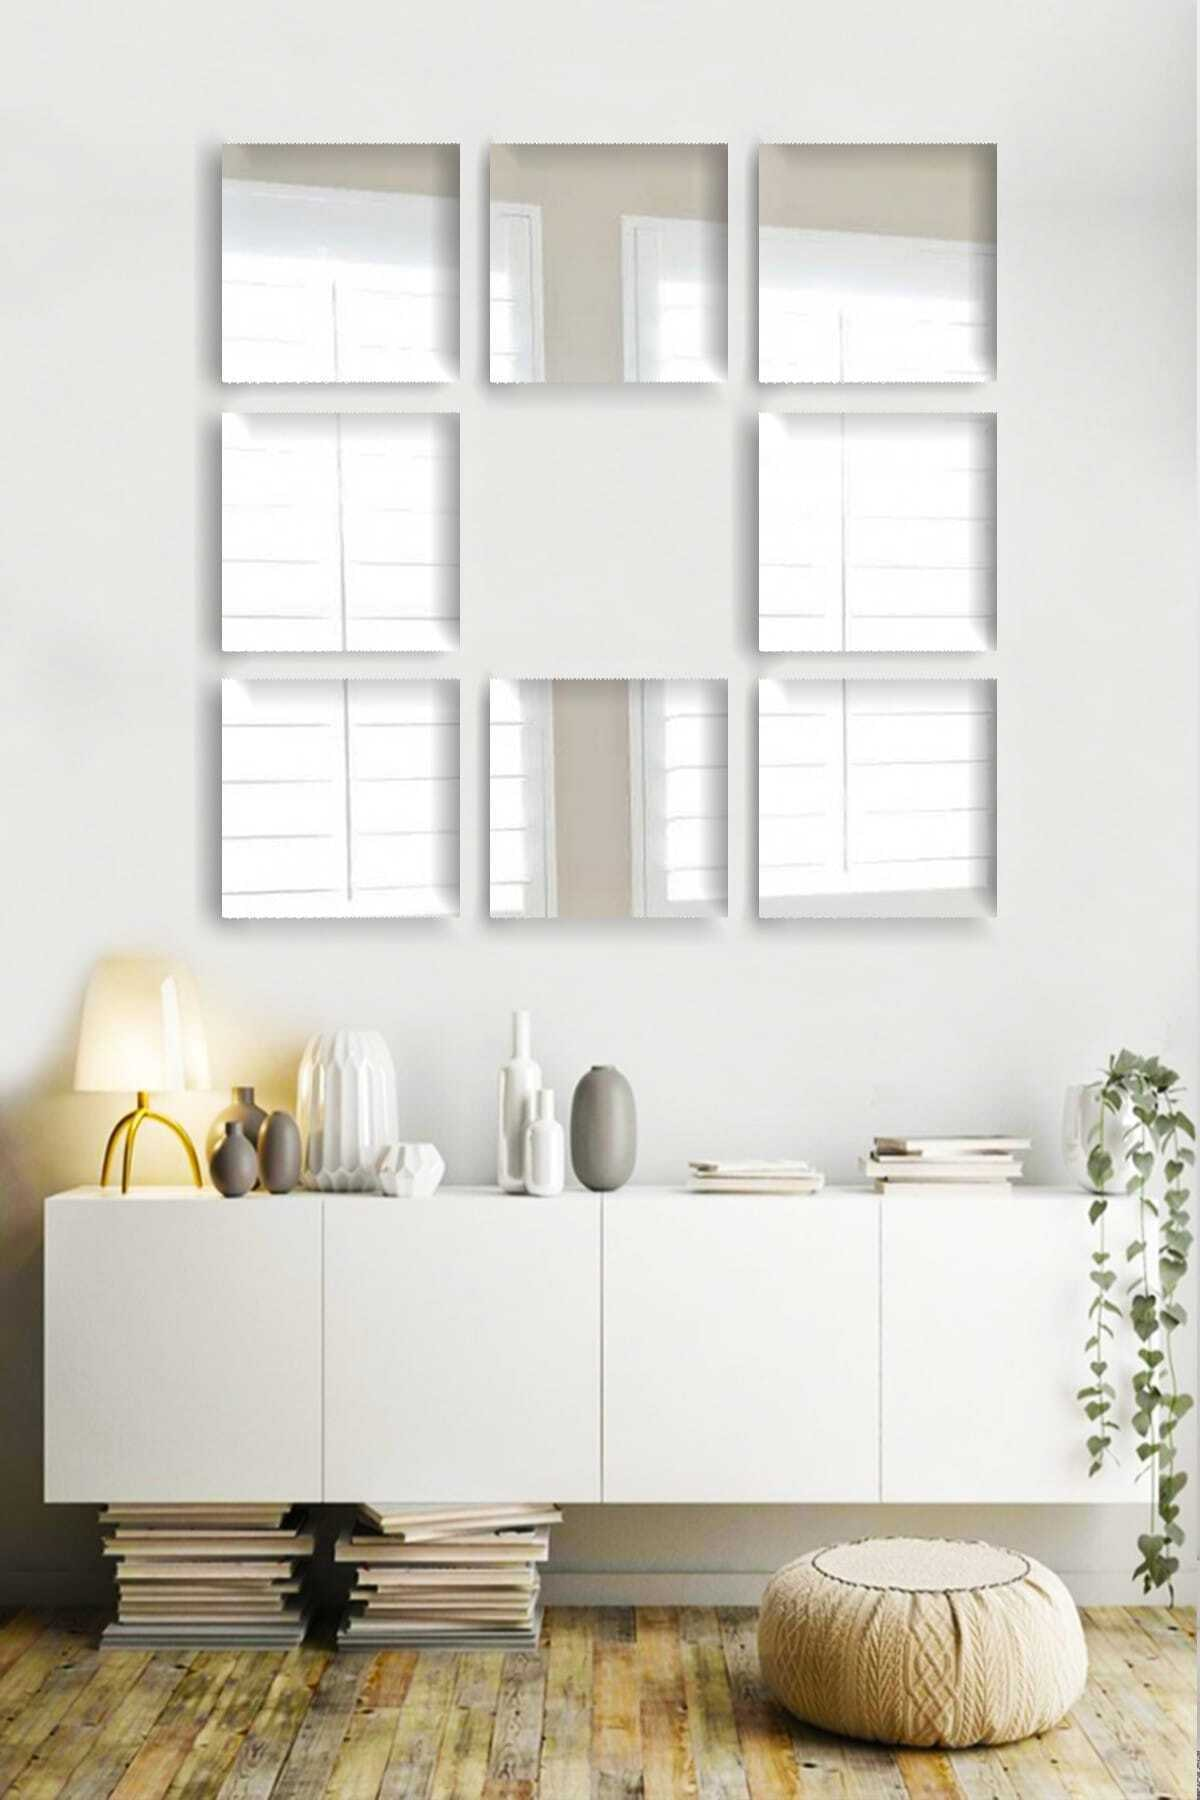 bluecape 8 Parça 20x20cm Antre Hol Koridor Duvar Salon Mutfak Banyo Wc Ofis Çocuk Yatak Odası Set Ayna 2